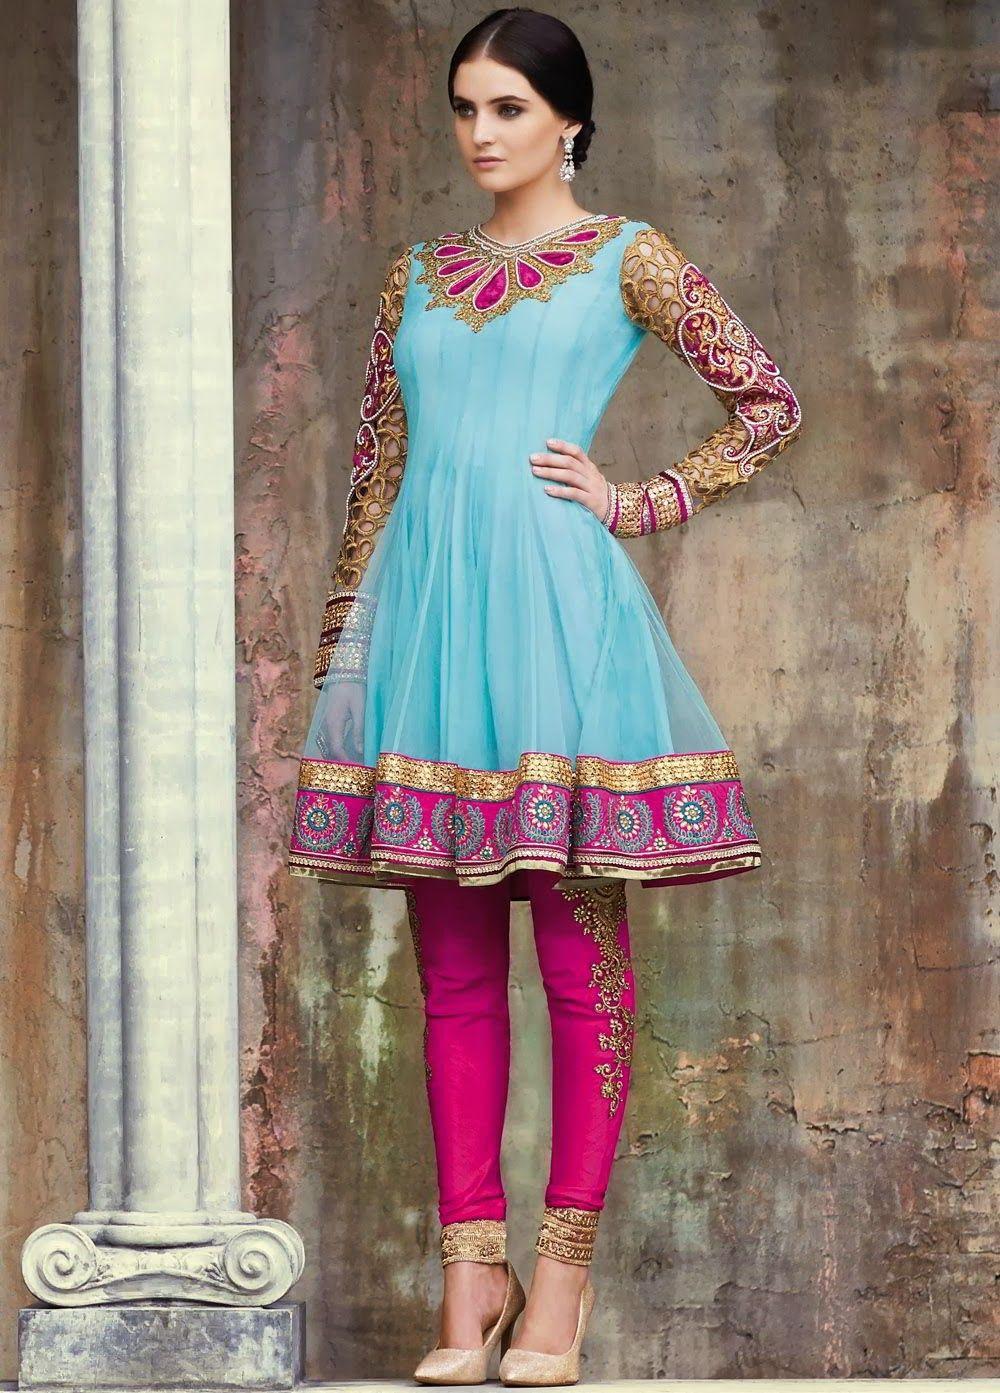 qwrehe | Desi-Ness | Pinterest | Indian bridal and Desi